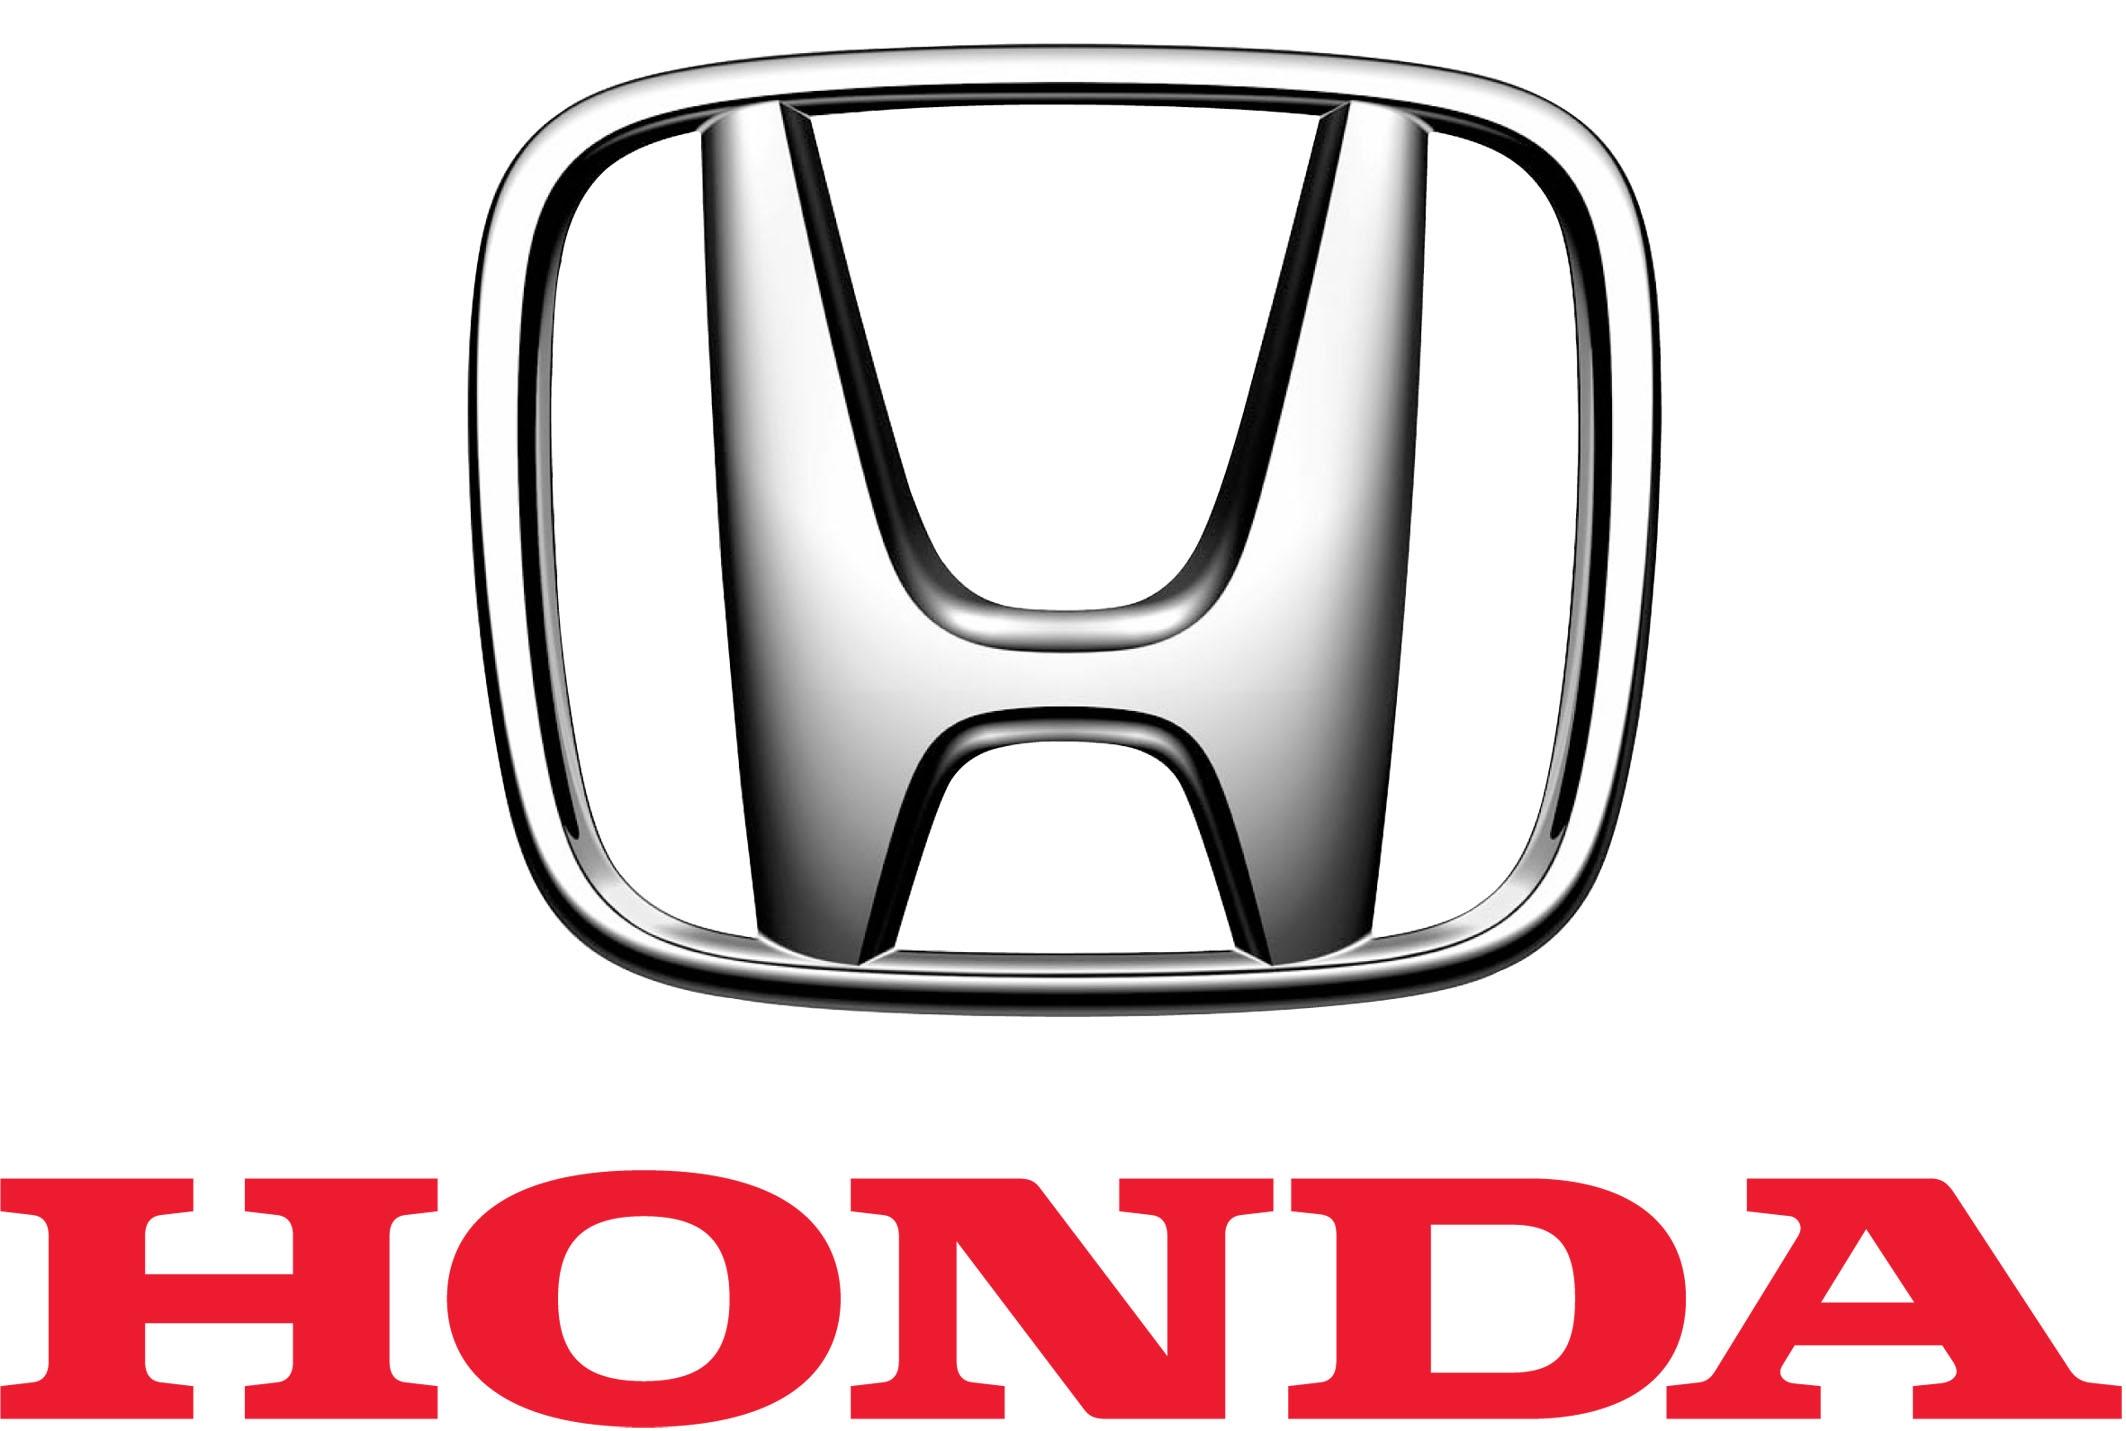 Honda clipart hoda Of Honda Small Logo Honda